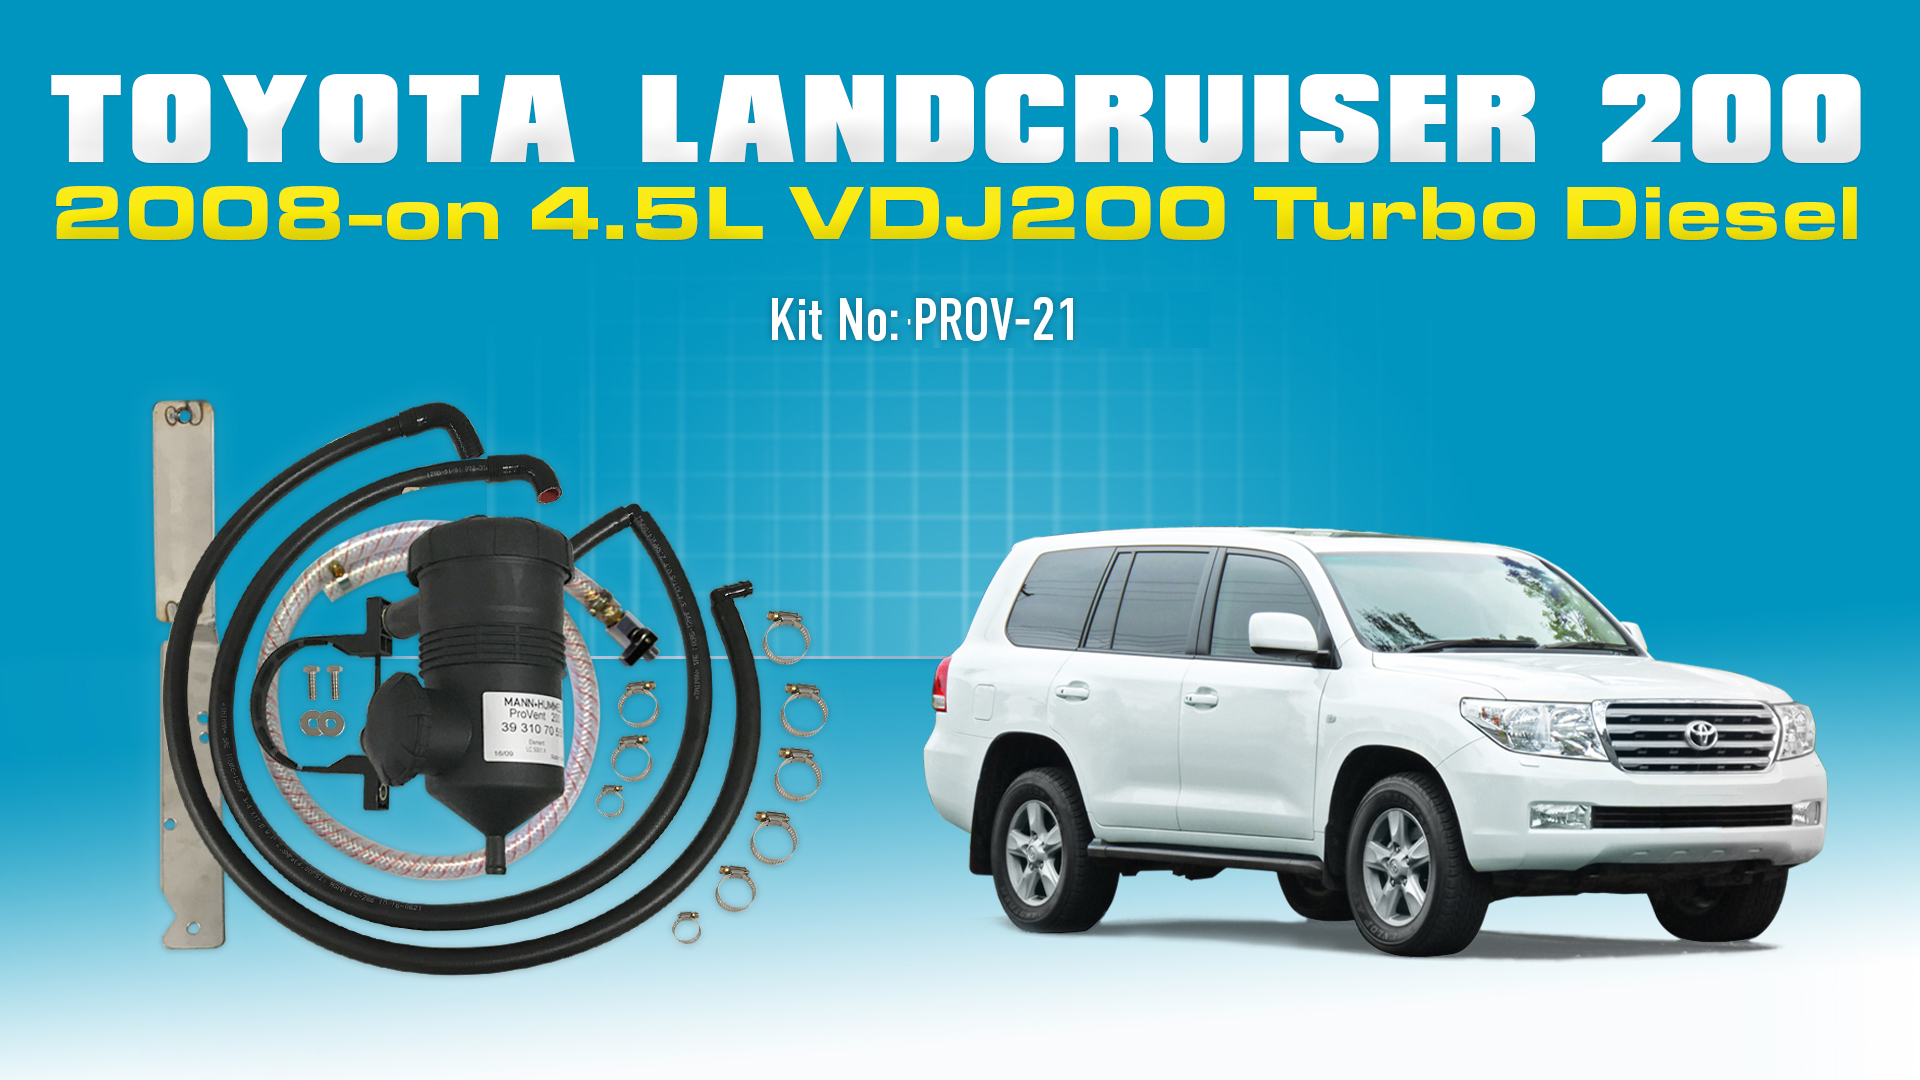 Toyota Landcruiser 2008 On 45l Vdj 200s T Diesel Provent Oil Egr 1990 C1500 5 7 Vacuum Diagram 1987 Chevy Engine Catch Can Kit Online Store